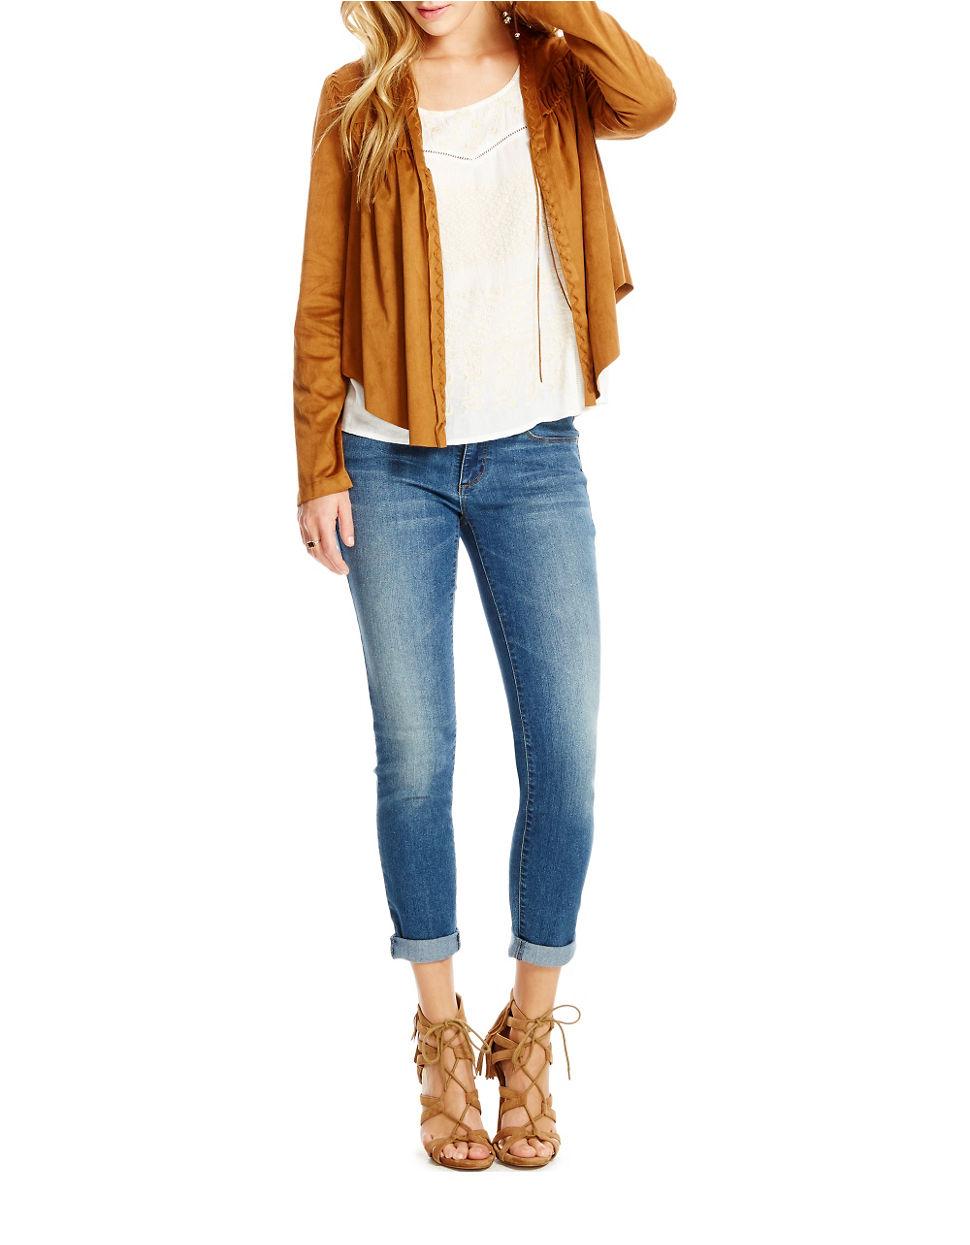 7b3d632da60 Lyst - Jessica Simpson Tulip Sueded Jacket in Yellow